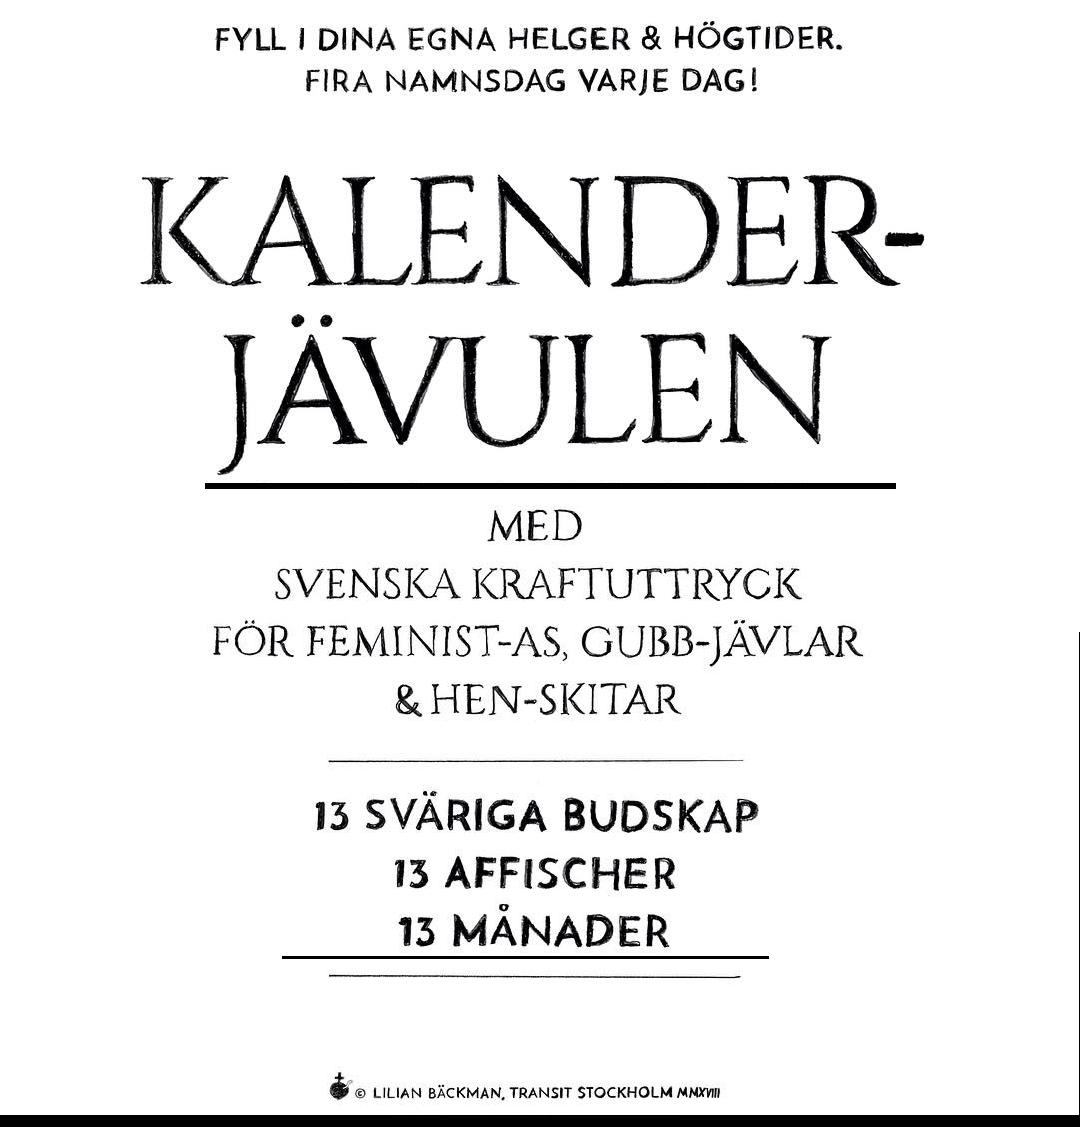 KALENDERJÄVULEN 1